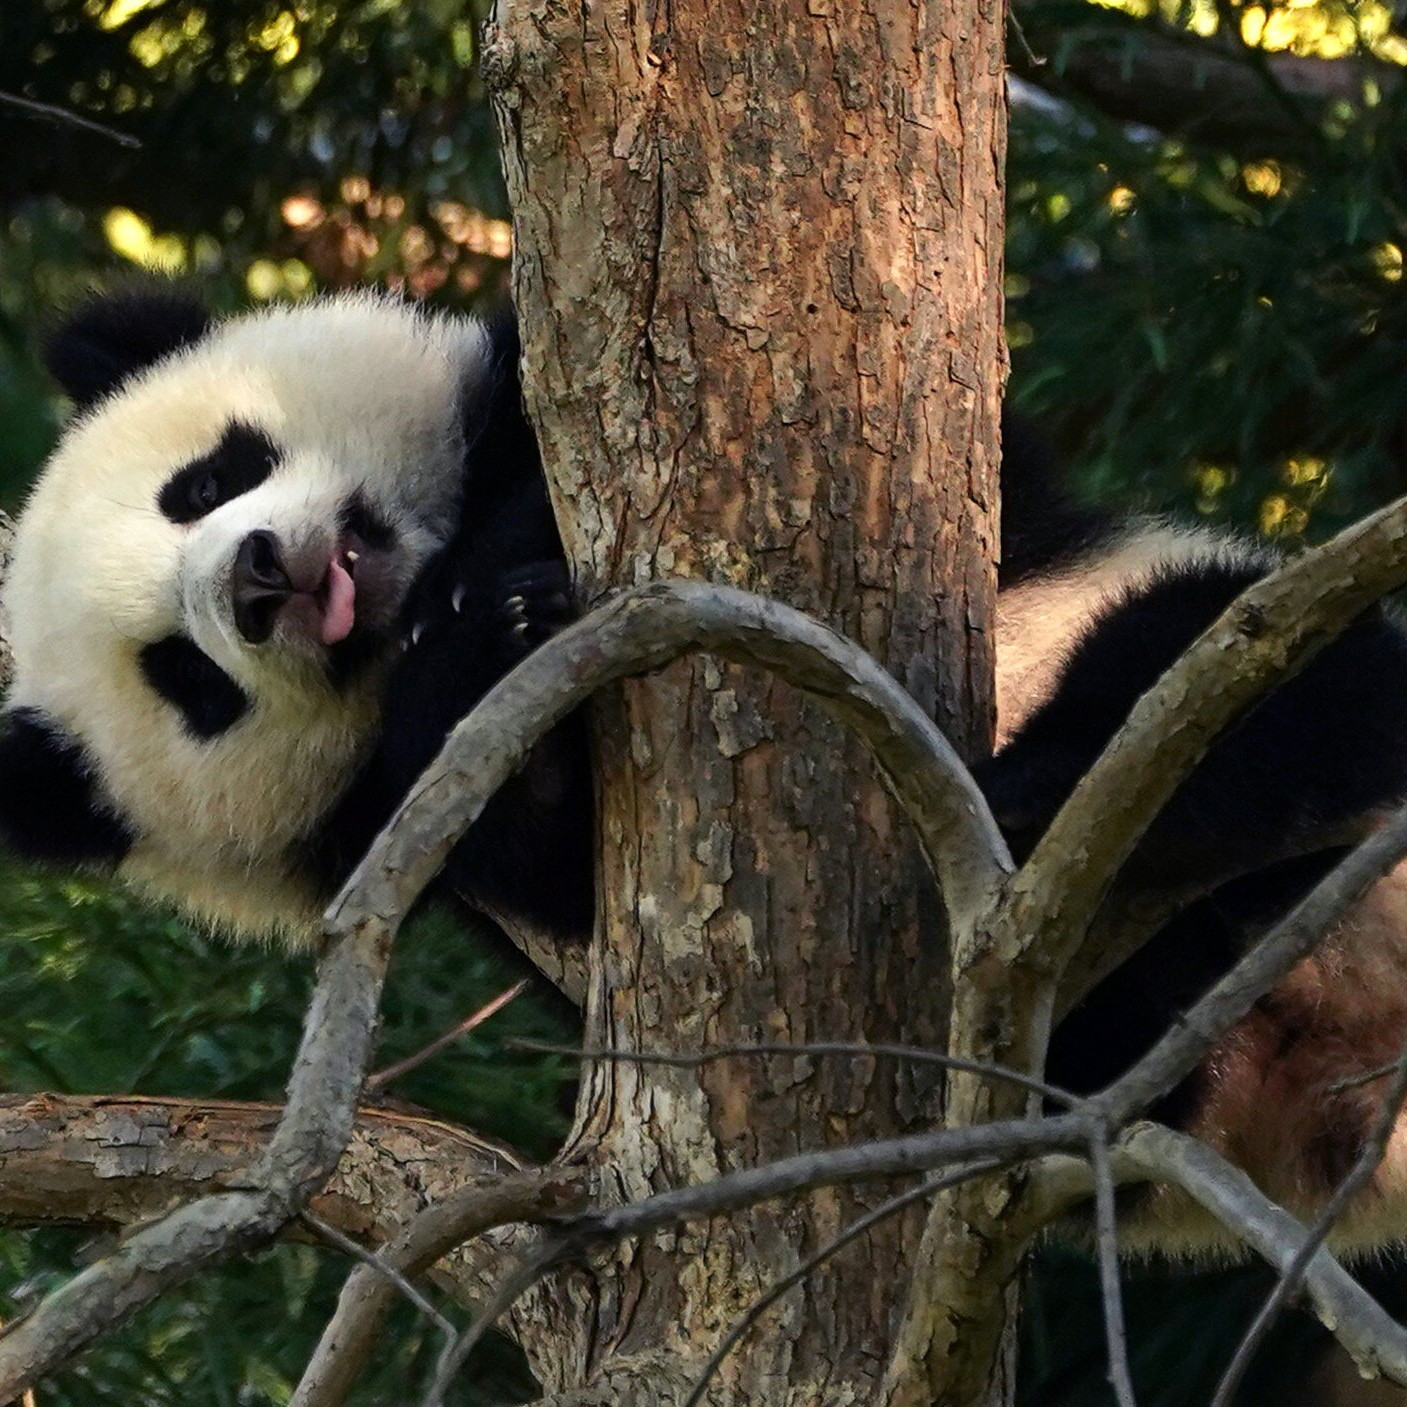 panda zoo national zoo washington